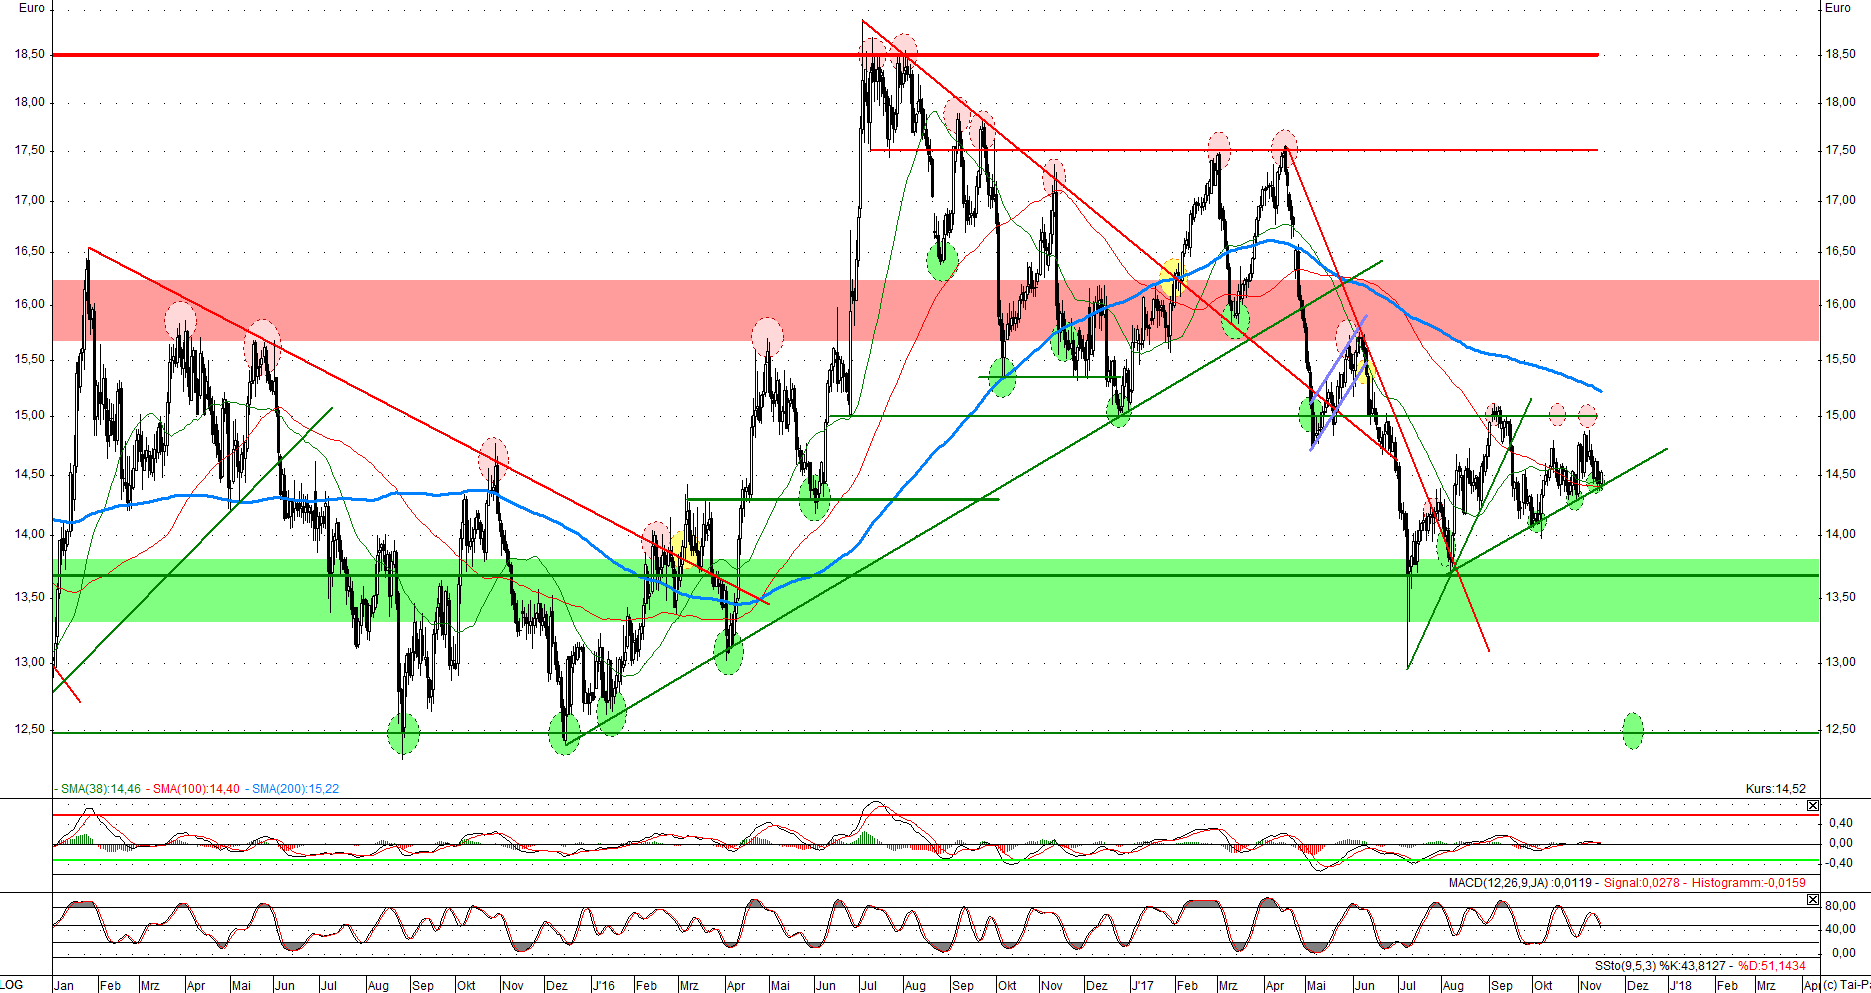 ke46 - 7 - 2017.11.17-silver-eur